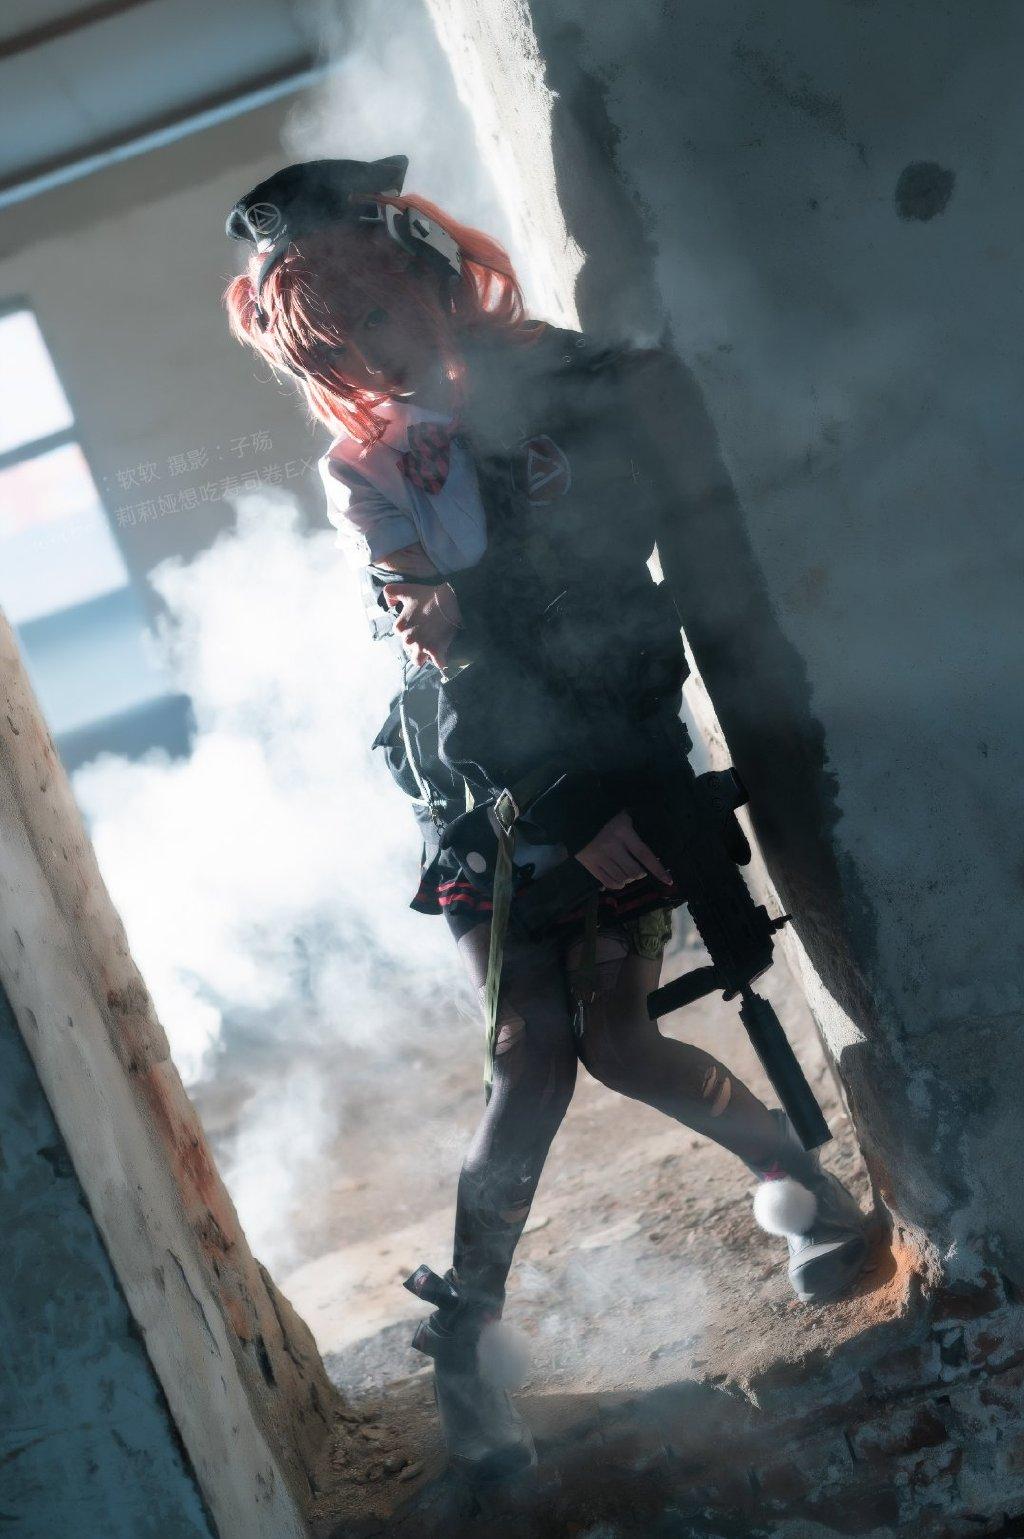 [COS]少女前线 MP7 @软软 「要吃我的糖吗?不过我先声明,这可是酸的哦…酸的哦!」 COSPLAY-第7张